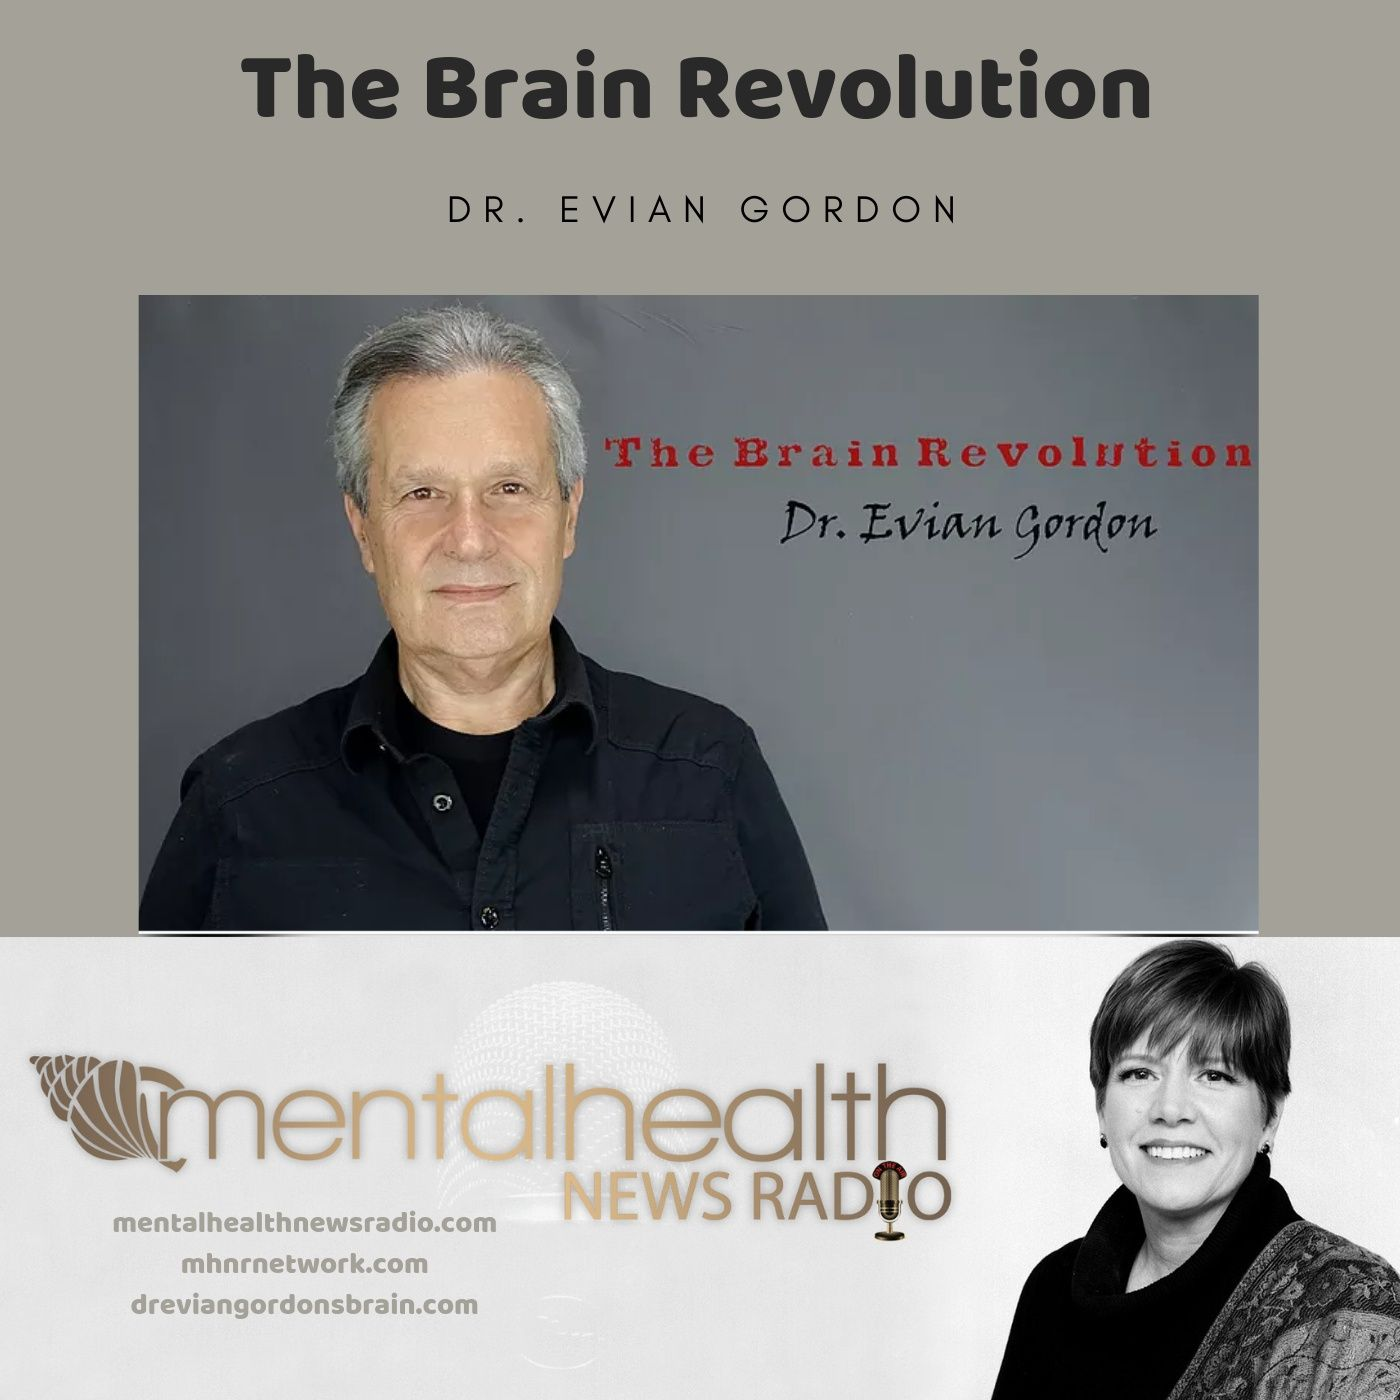 Mental Health News Radio - The Brain Revolution with Dr. Evian Gordon